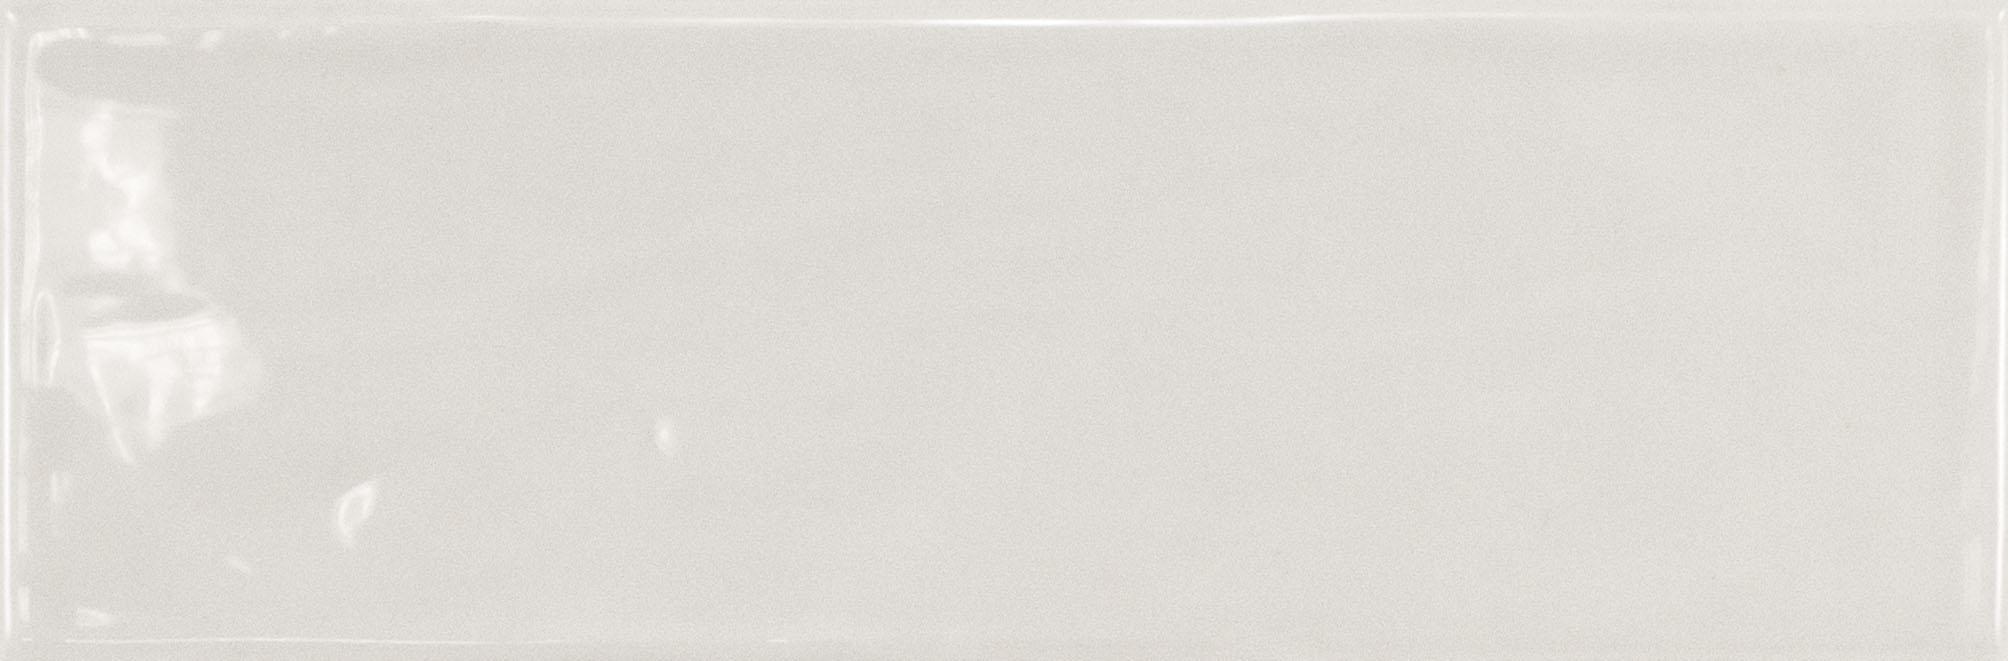 Country Gris Claro 6.5x20 cm